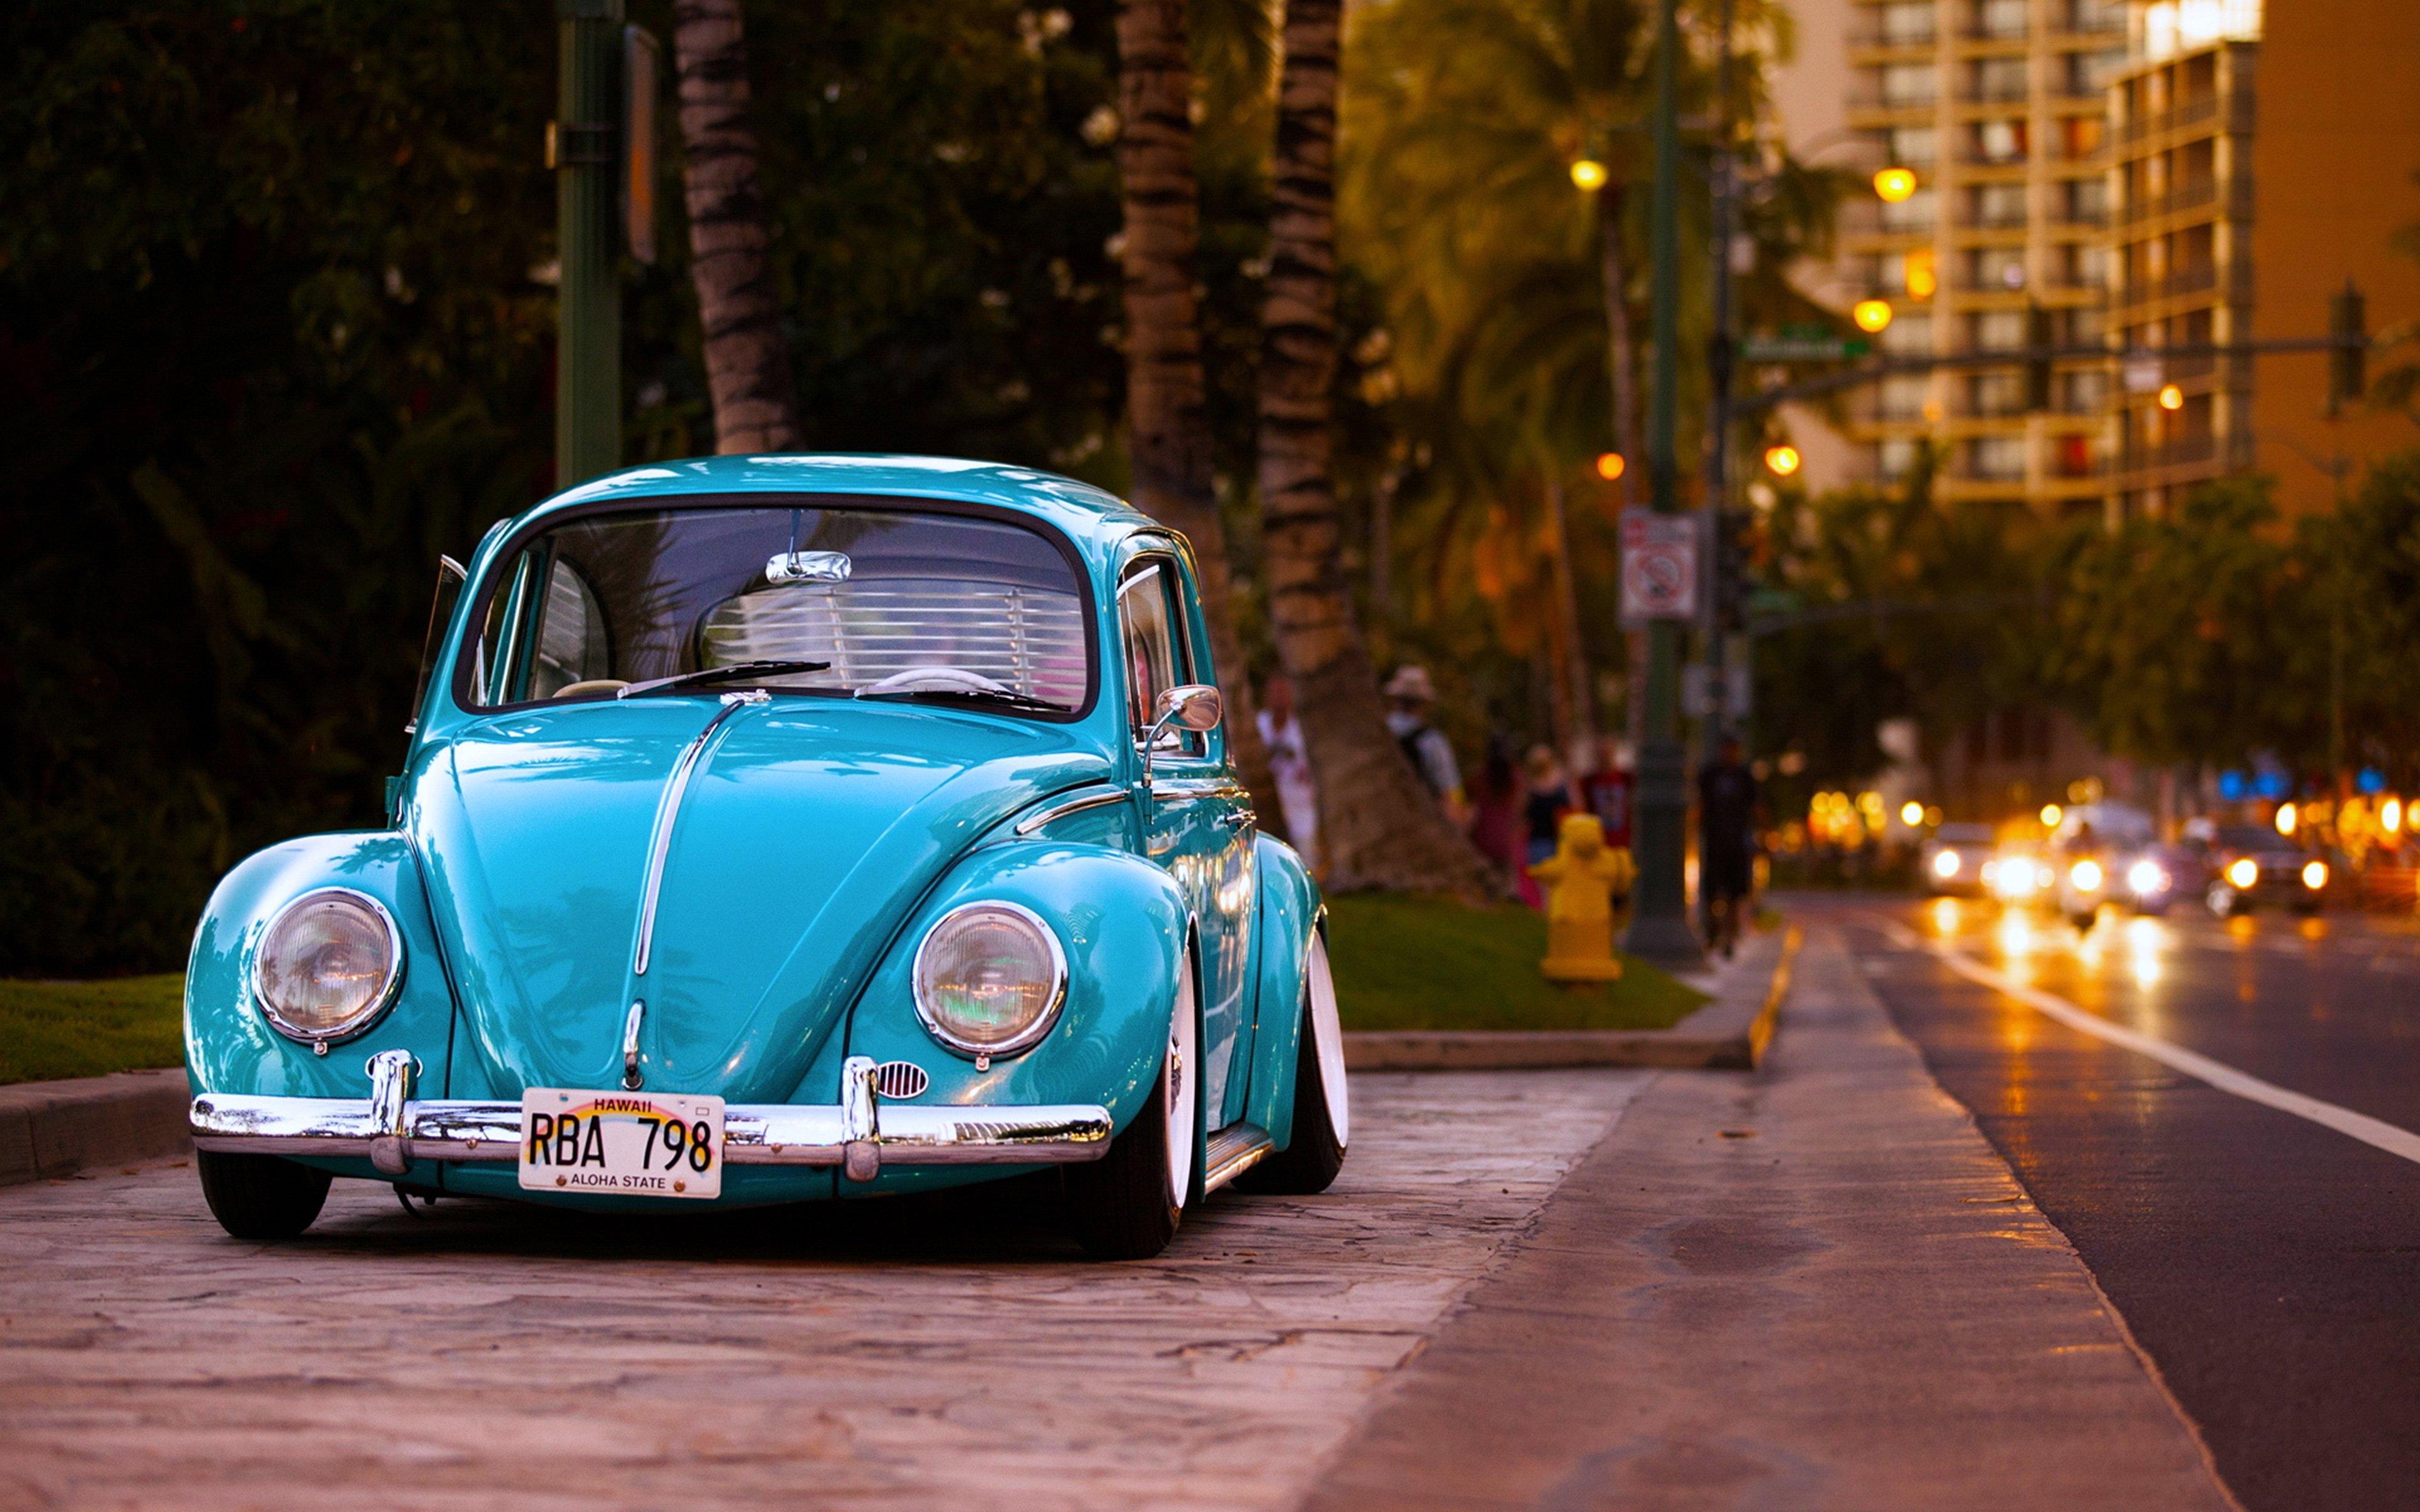 volkswagen beetle cars old classic hawaii city road motors buildings wallpaper 3840x2400. Black Bedroom Furniture Sets. Home Design Ideas